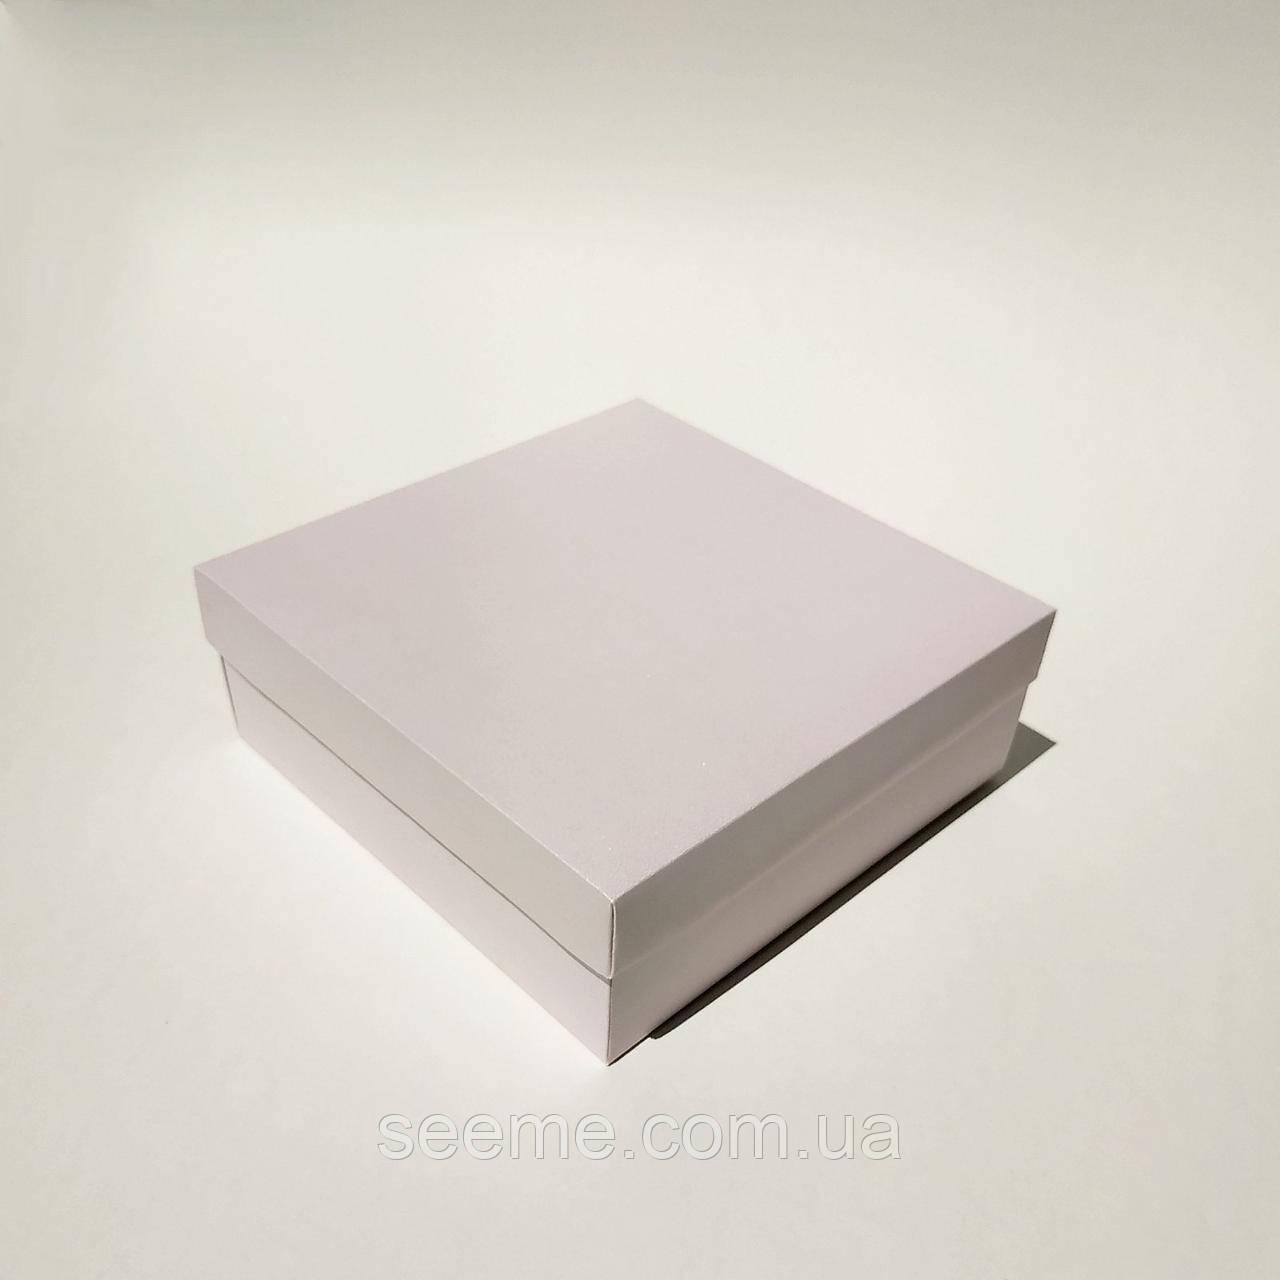 Коробка подарочная 200х200х70 мм, цвет перламутровый нежно-лавандовый